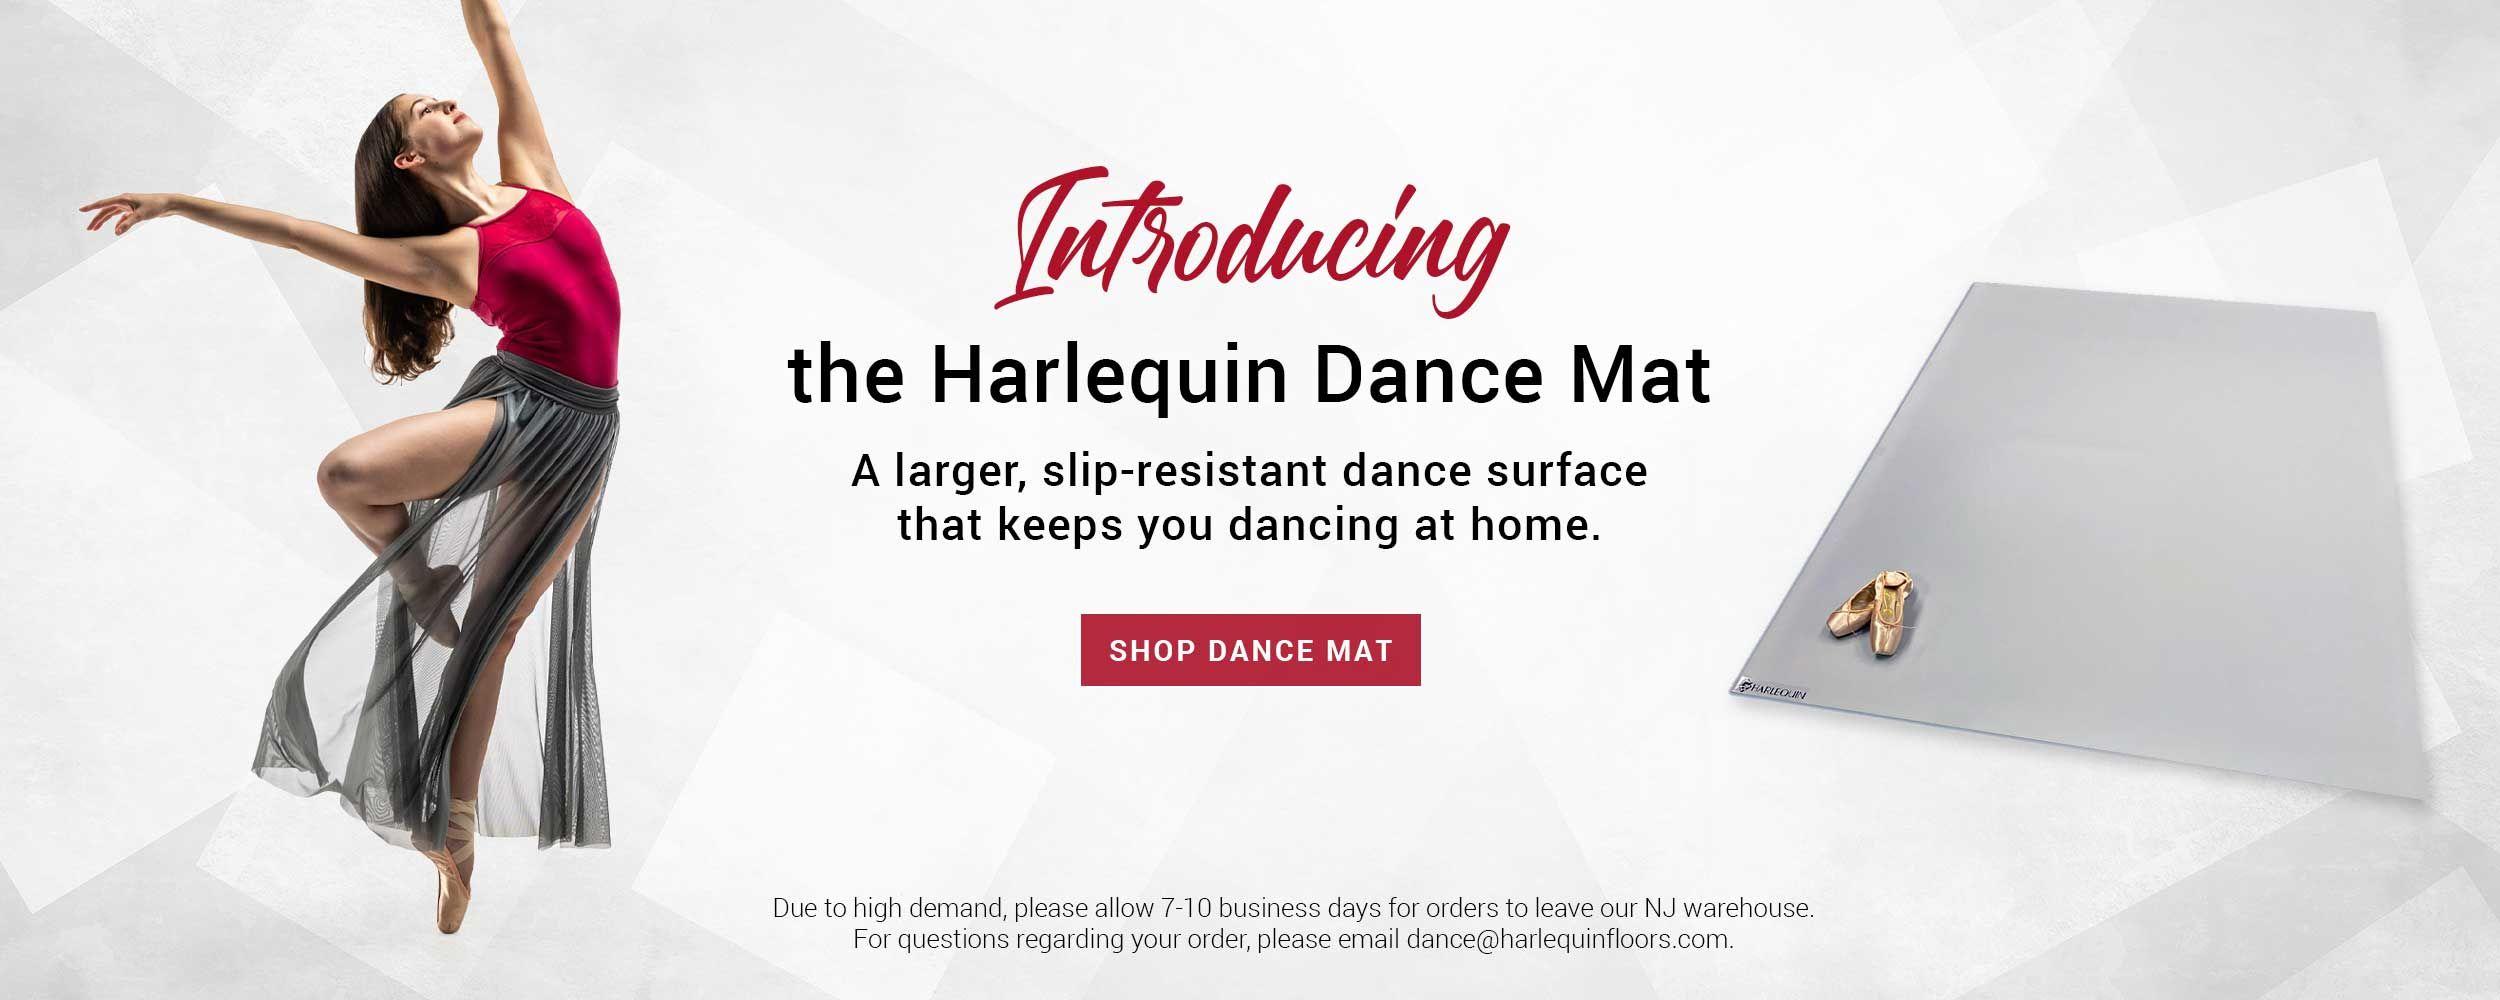 Harlequin Dance Mat Harlequin Floors In 2020 Harlequin Dance Harlequin Floors Dance Floor Vinyl